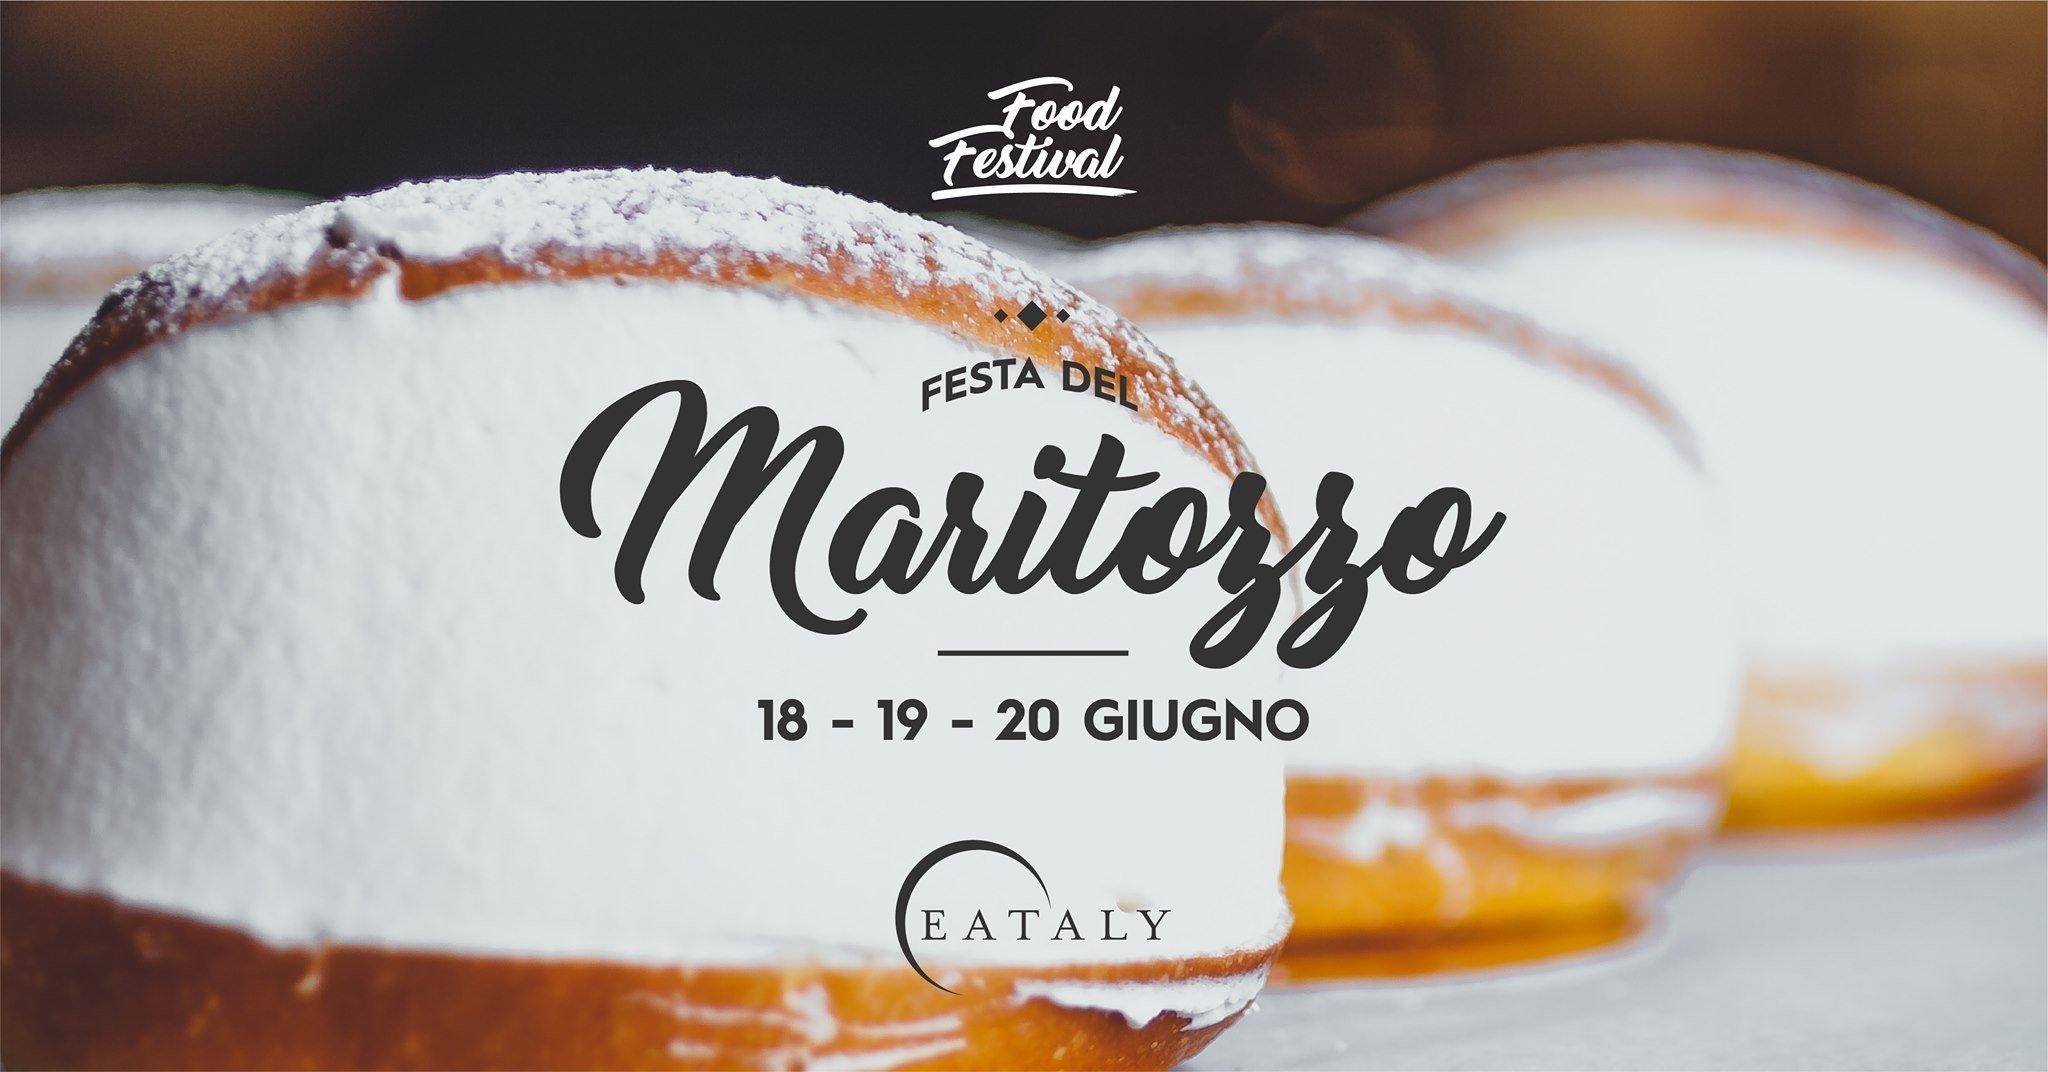 Feast of the Maritozzo